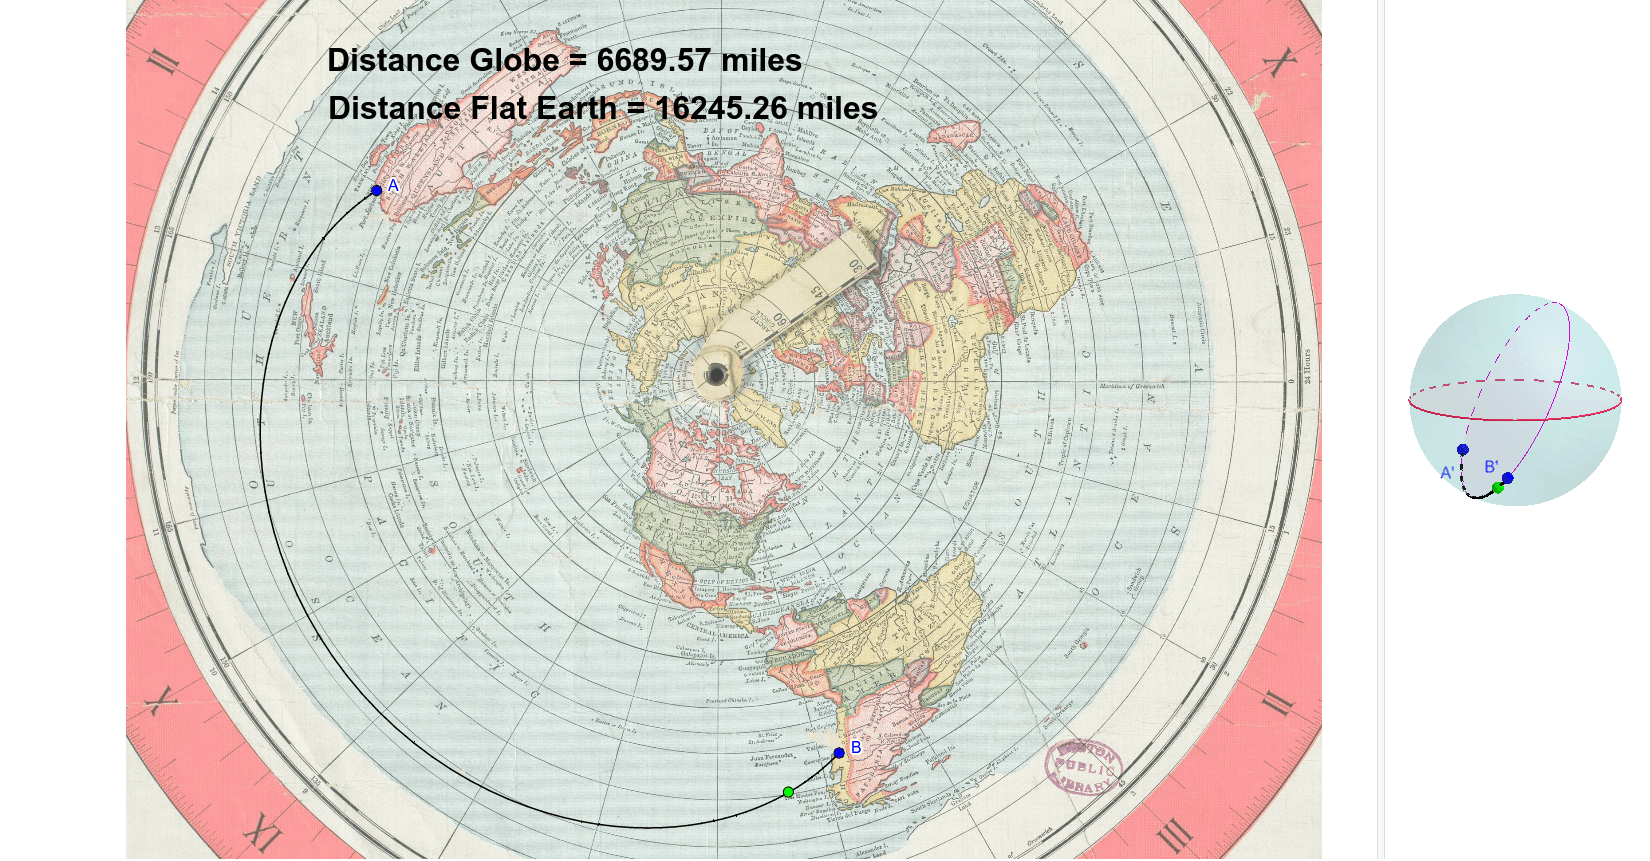 Flat earth great circle routes on gleason map geogebra flat earth great circle routes on gleason map author iskweb gumiabroncs Choice Image